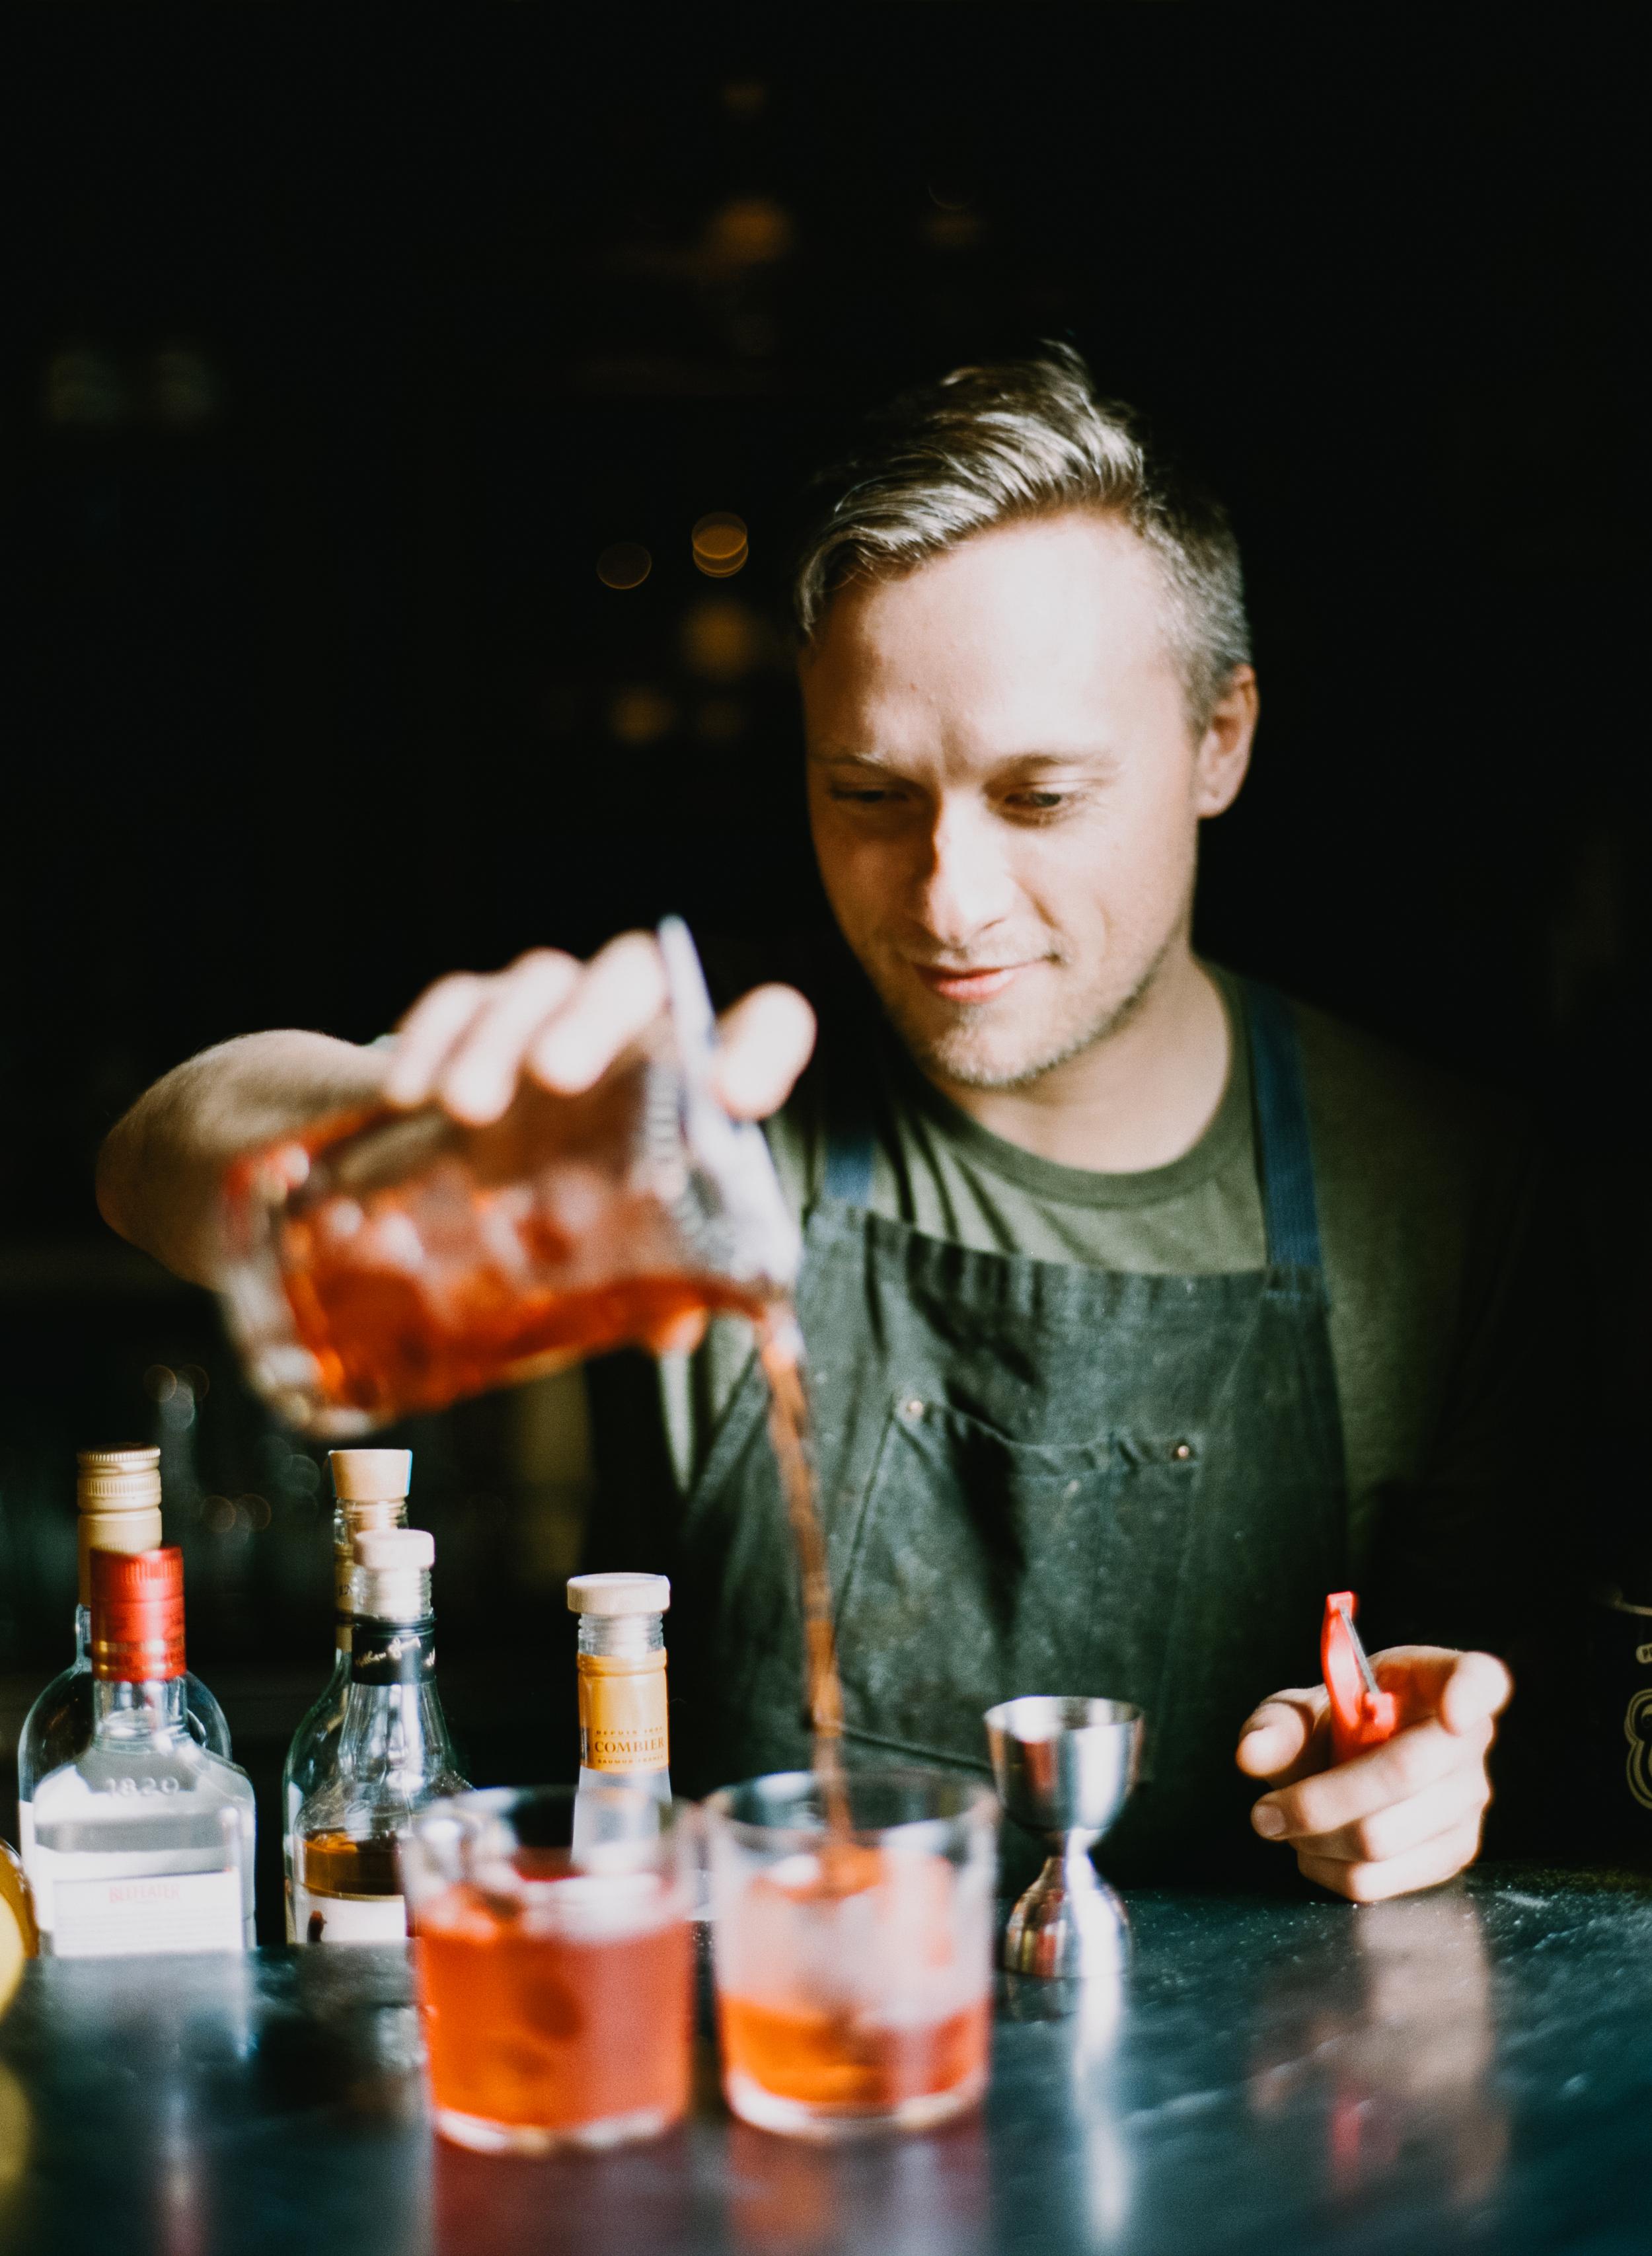 TrickDog_Bar_San_Francisco_City_Guide_Drinks_Cocktails_Lifestyle_Zack_Arp-758.jpg